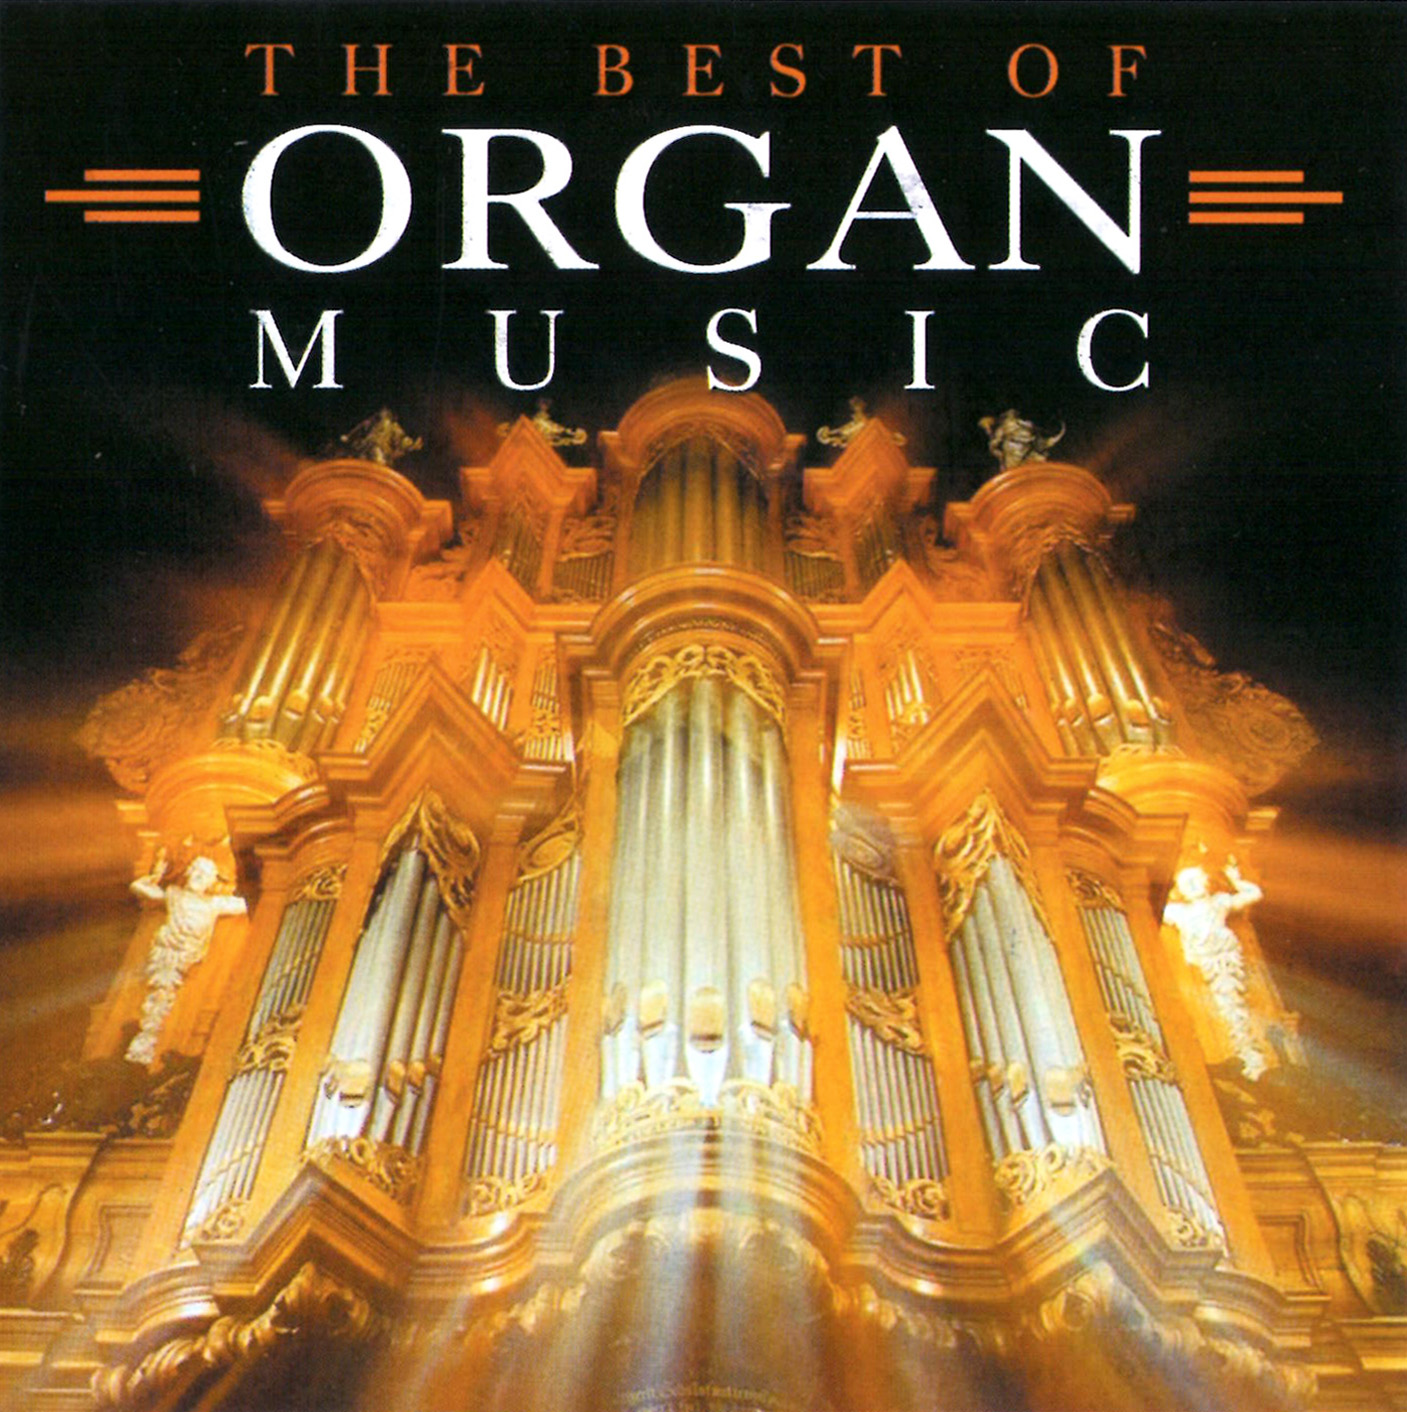 Organ Music [mp3]